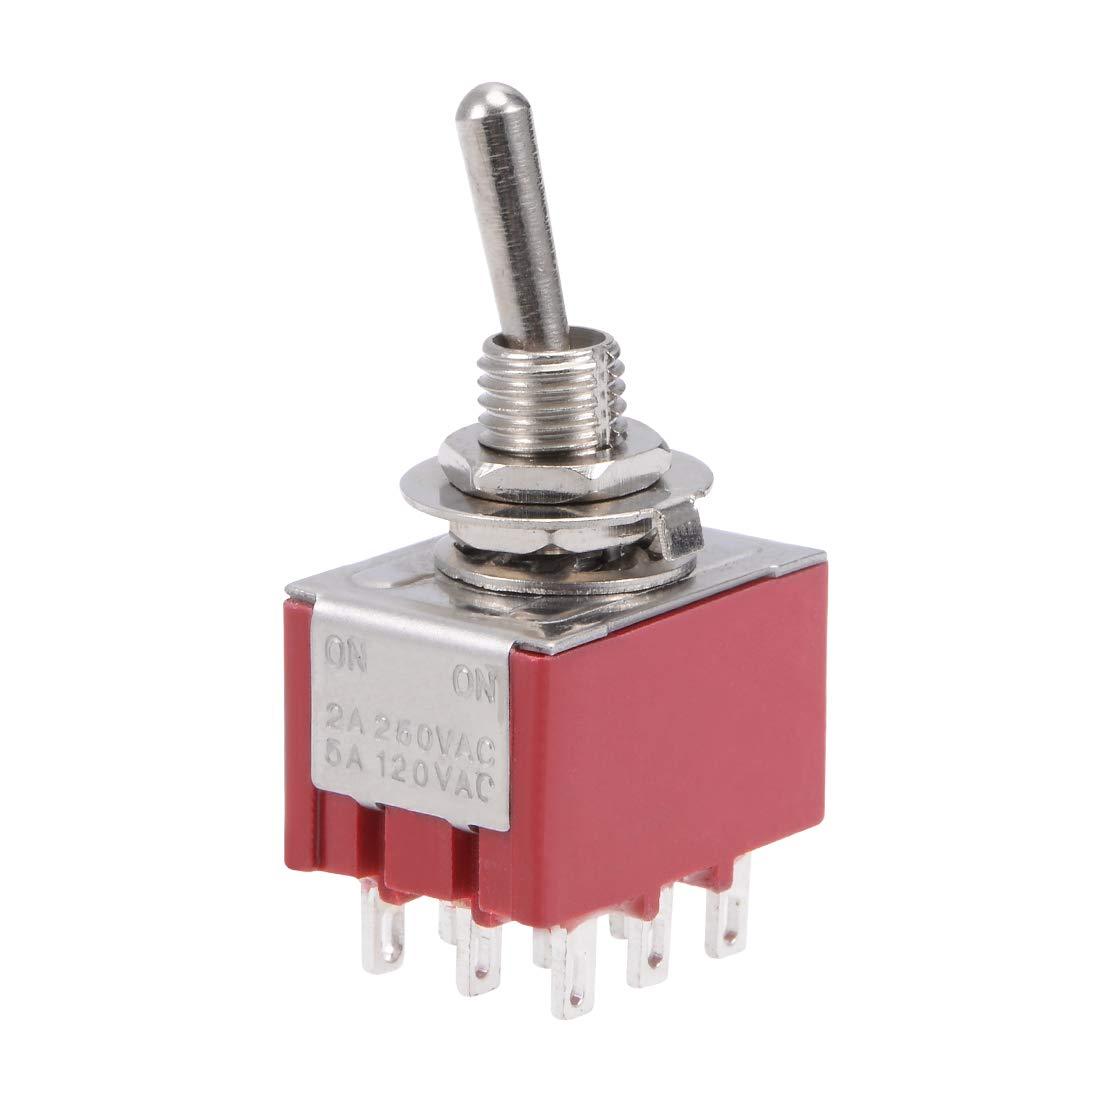 DIYhz 5Pcs AC 250V//2A 120V//5A ON//ON 2 Position 9 Pin SPDT Mini Micro Toggle Switch